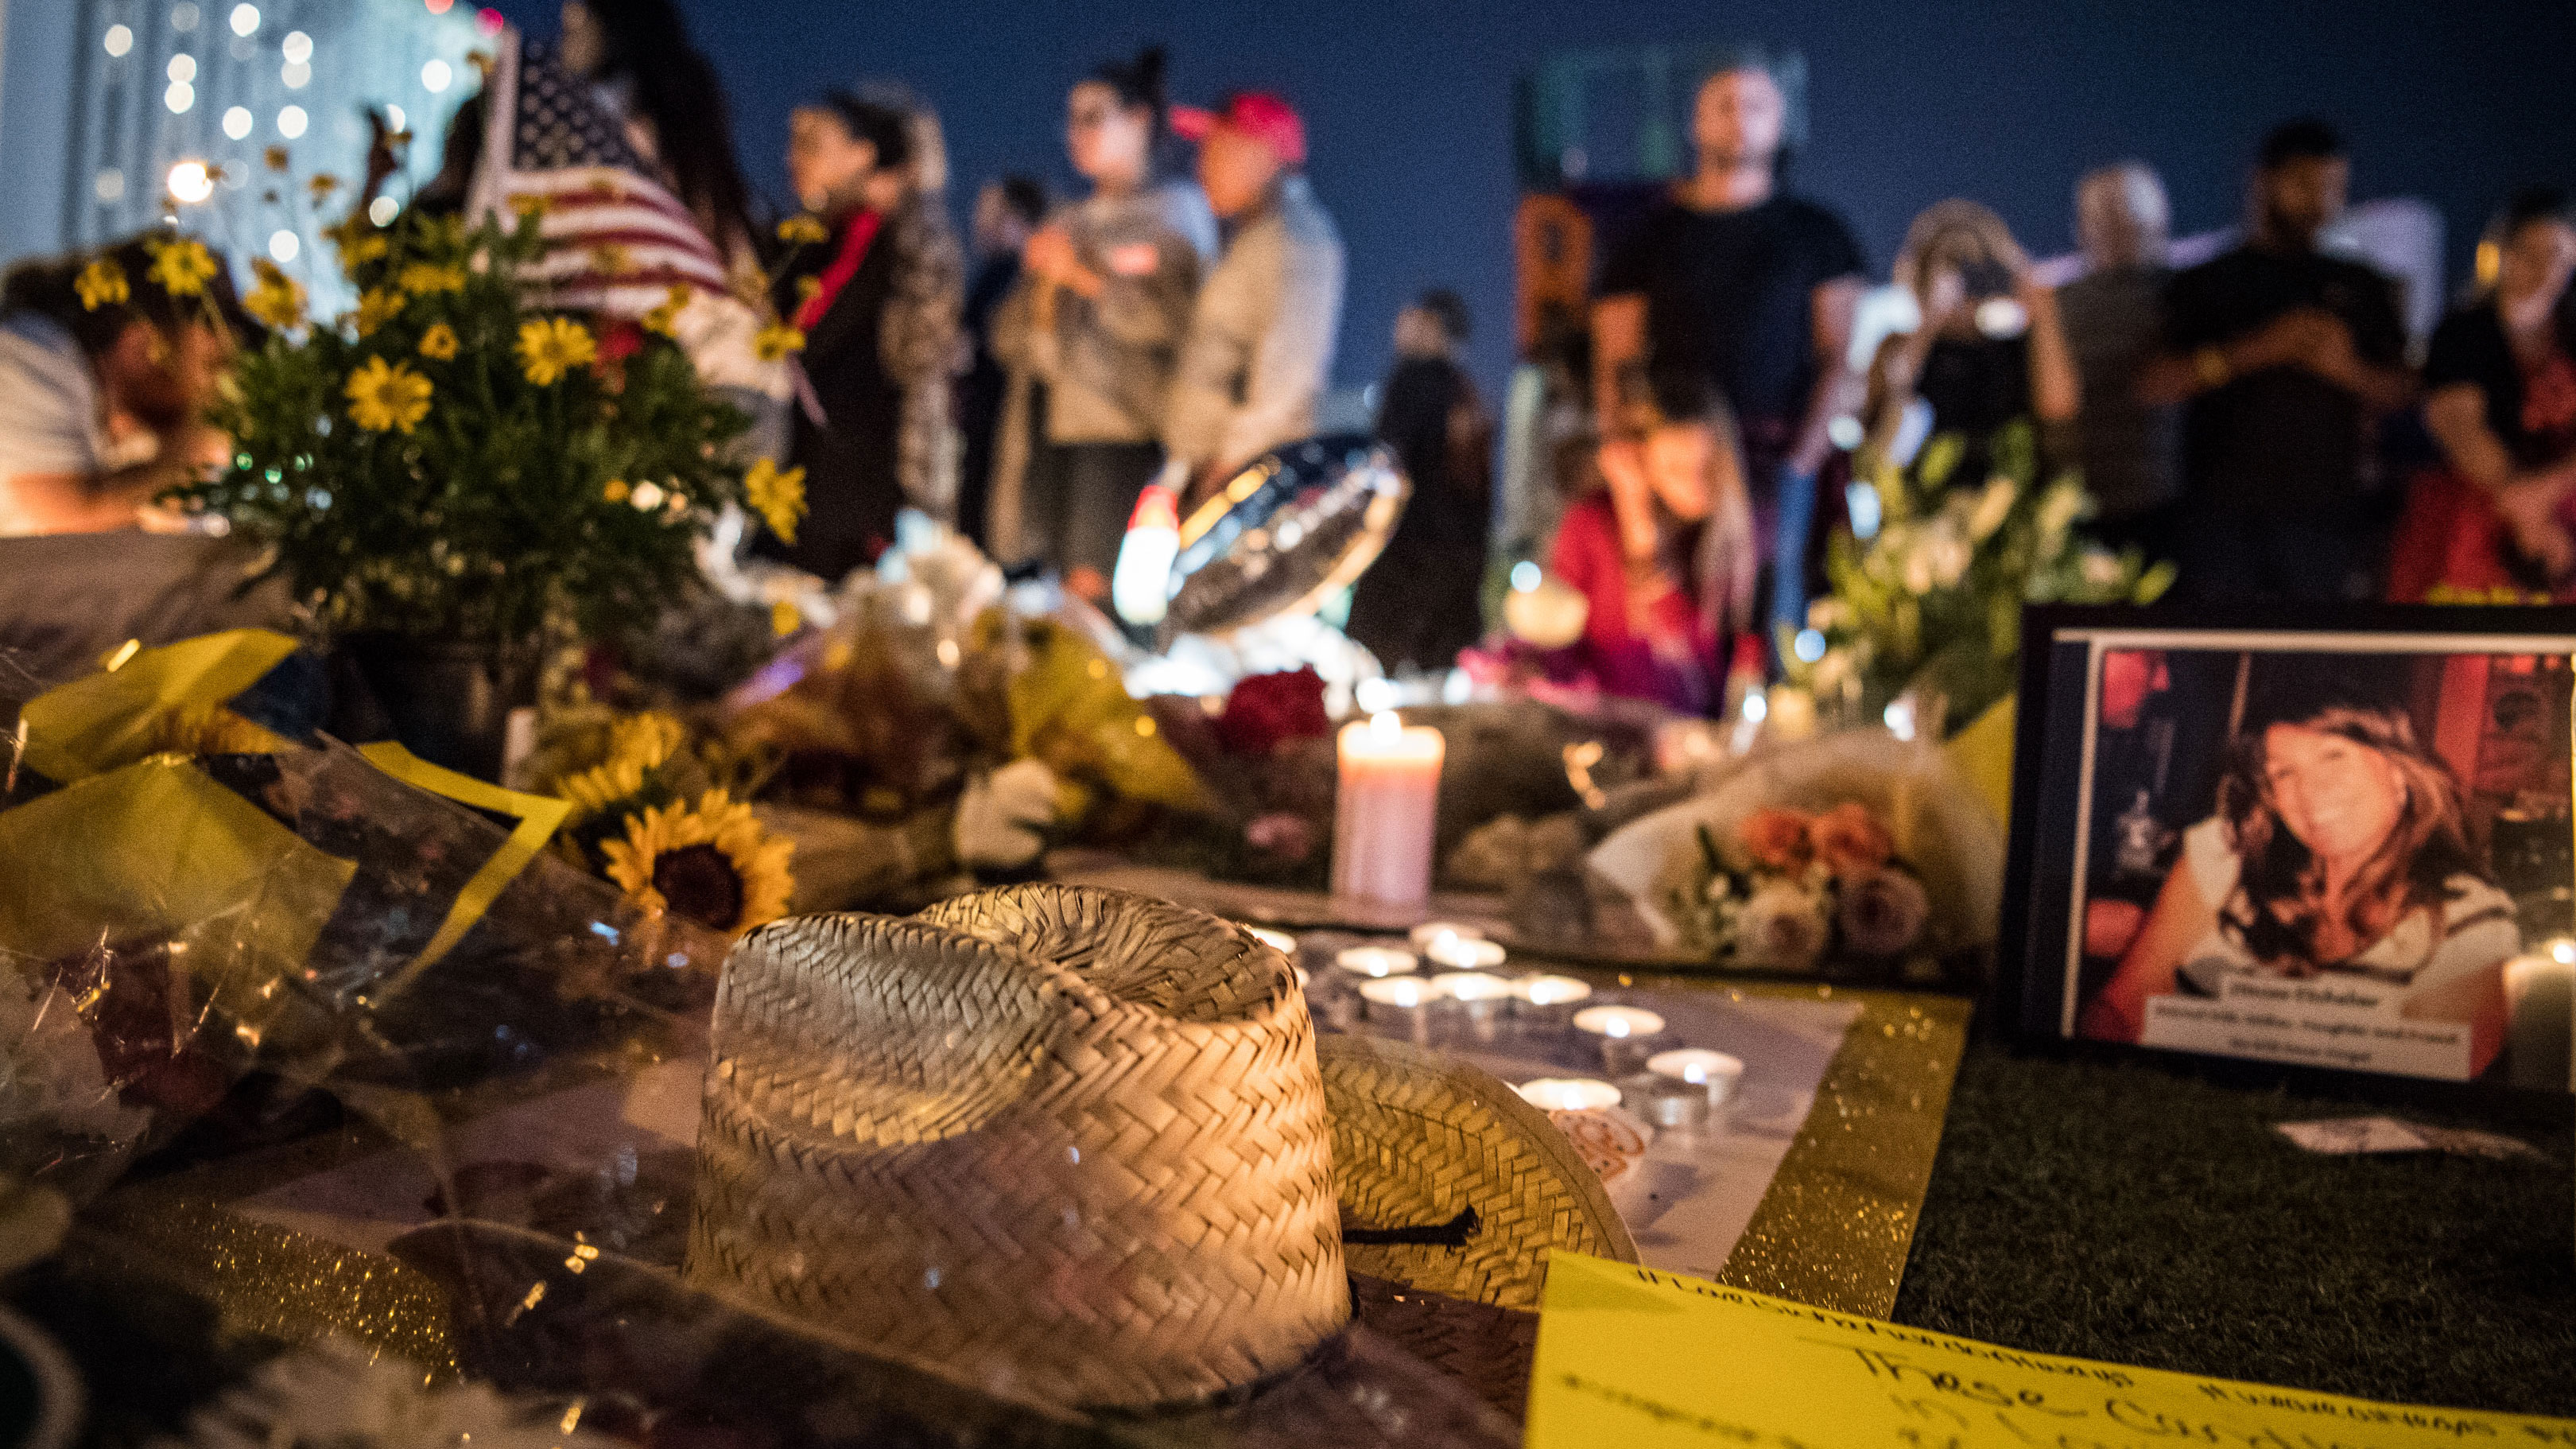 How Do Coroners Handle a Mass Tragedy Like the Las Vegas Shooting?